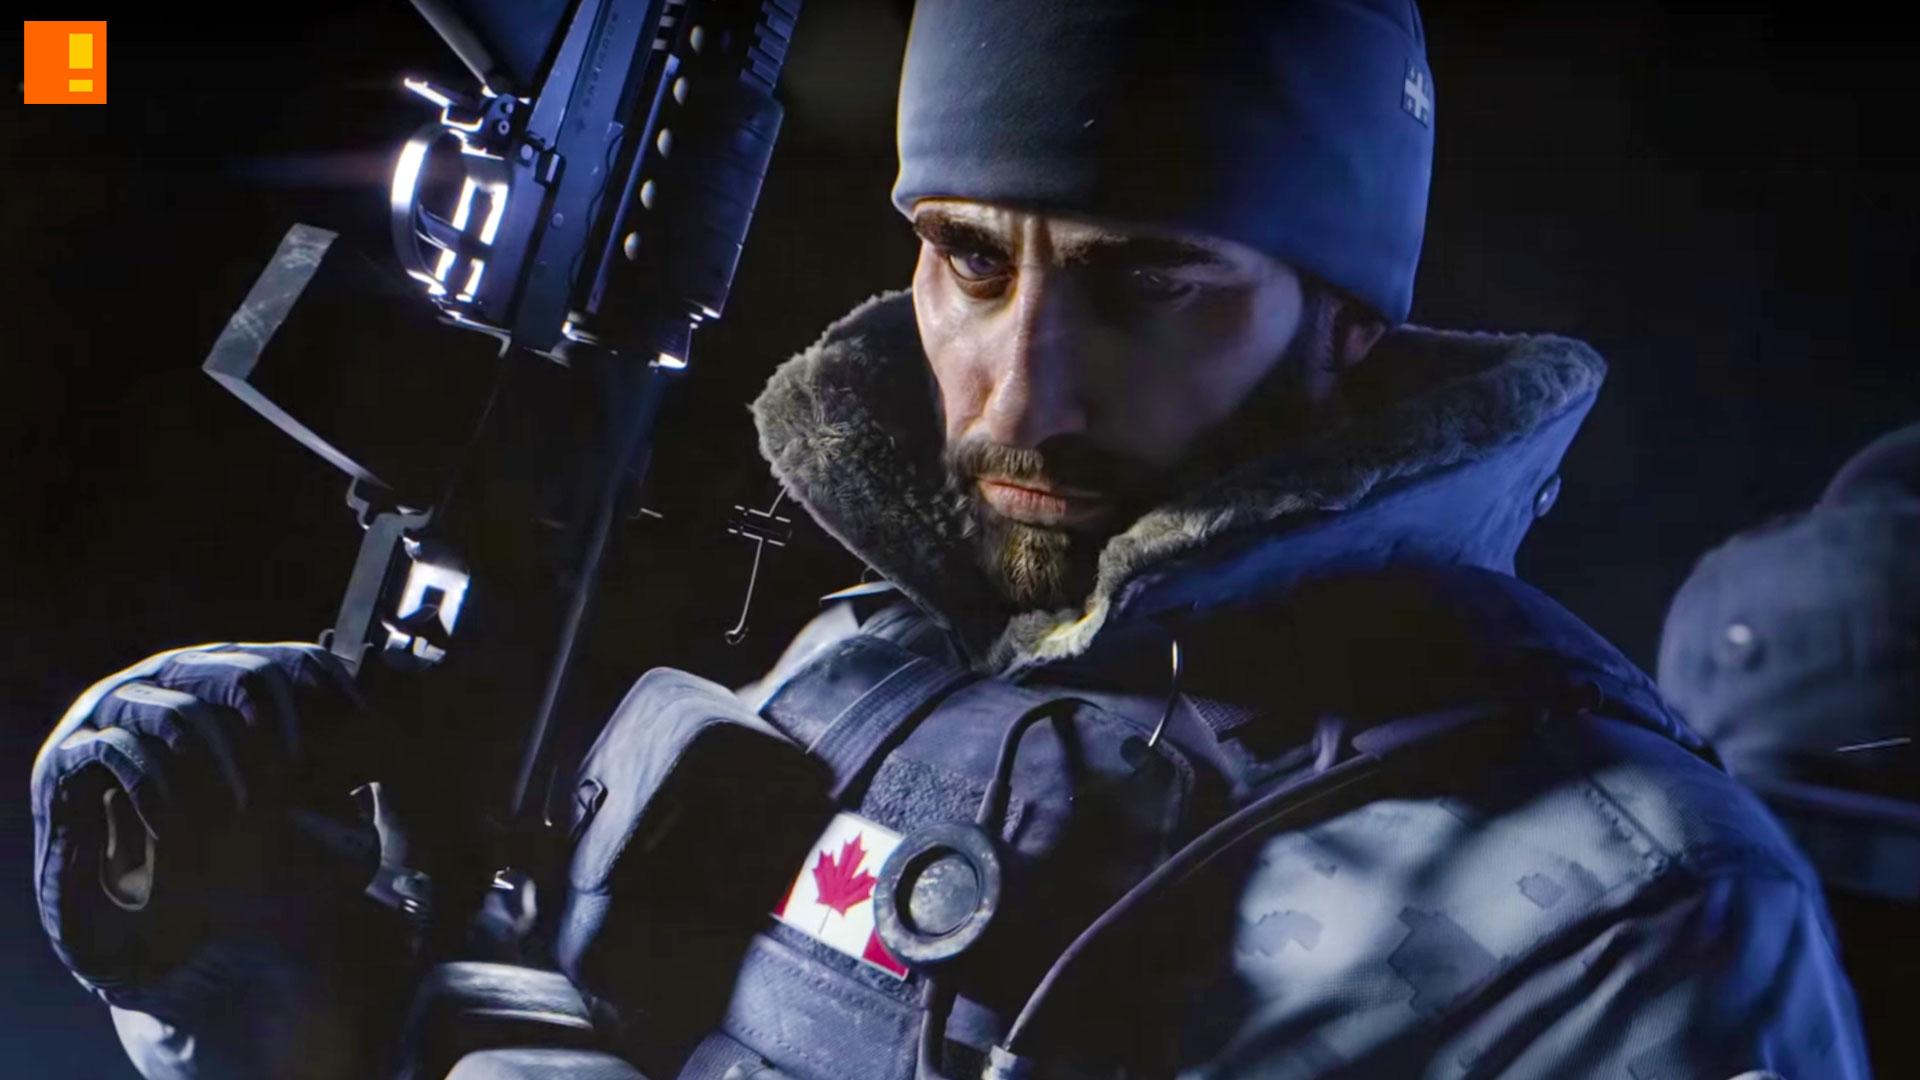 Tom Clancys Splinter Cell HD desktop wallpaper High Definition